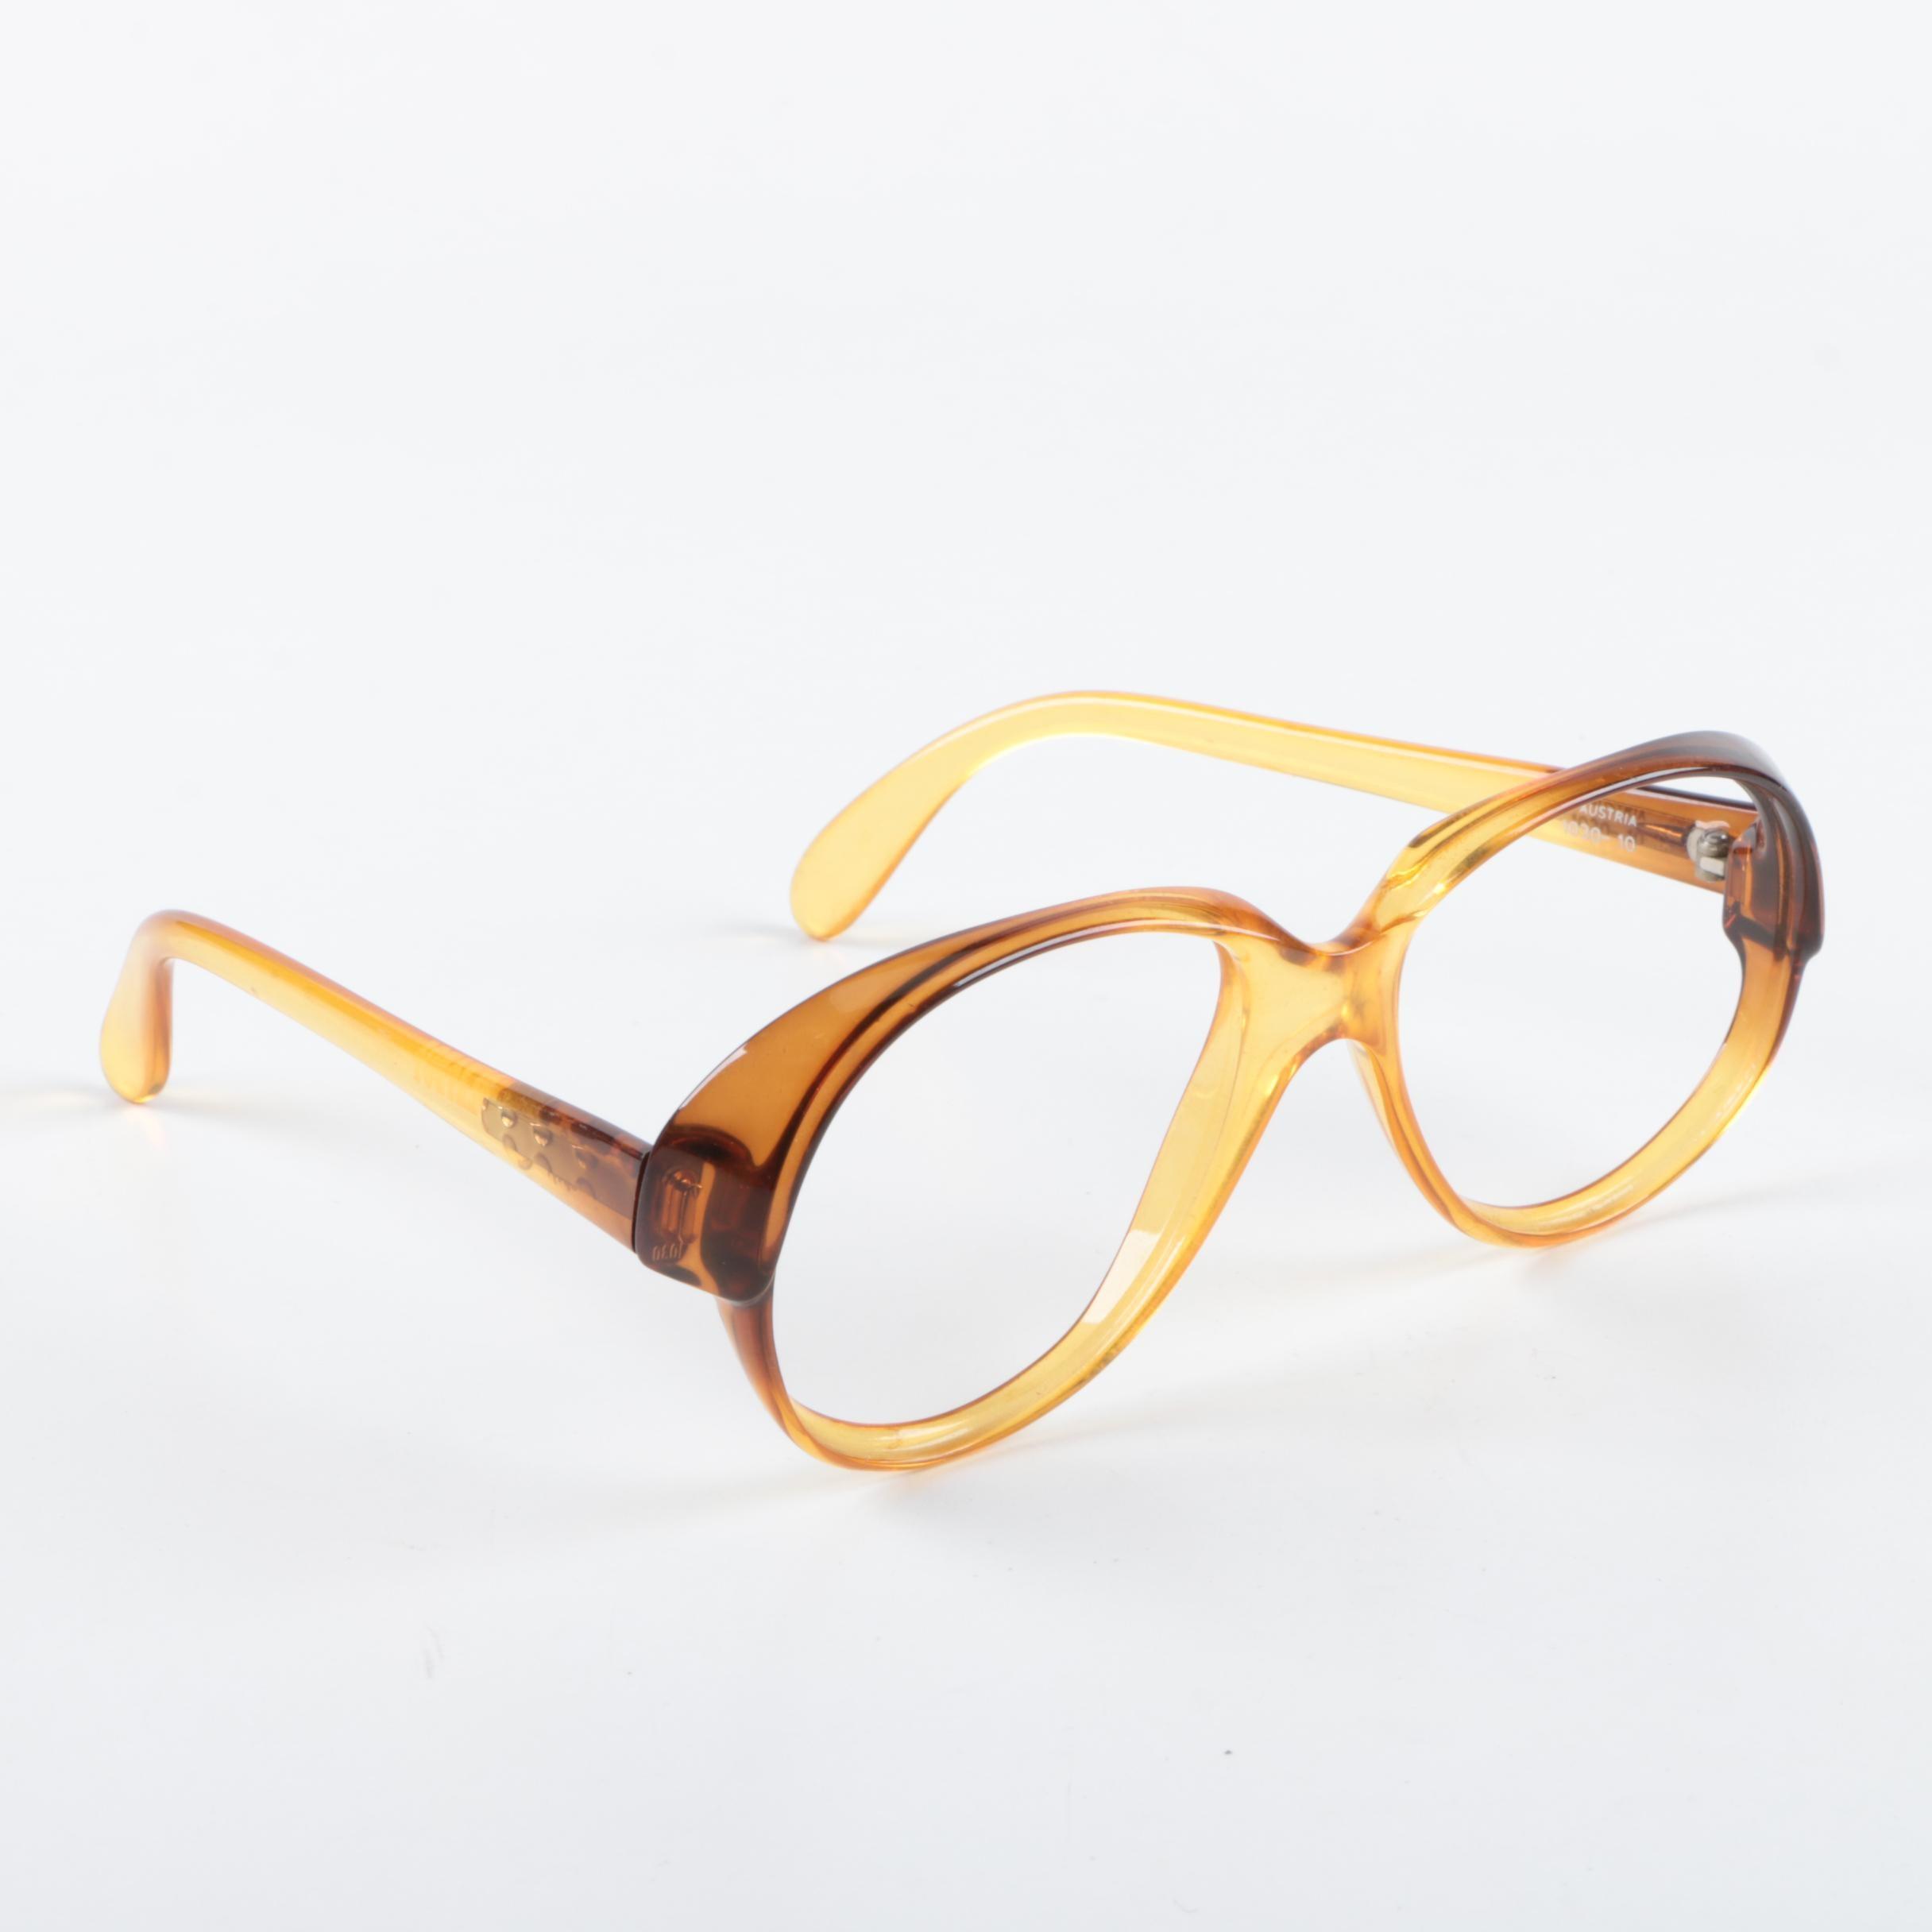 1980s Vintage Playboy 1030-10 Eyeglass Frames